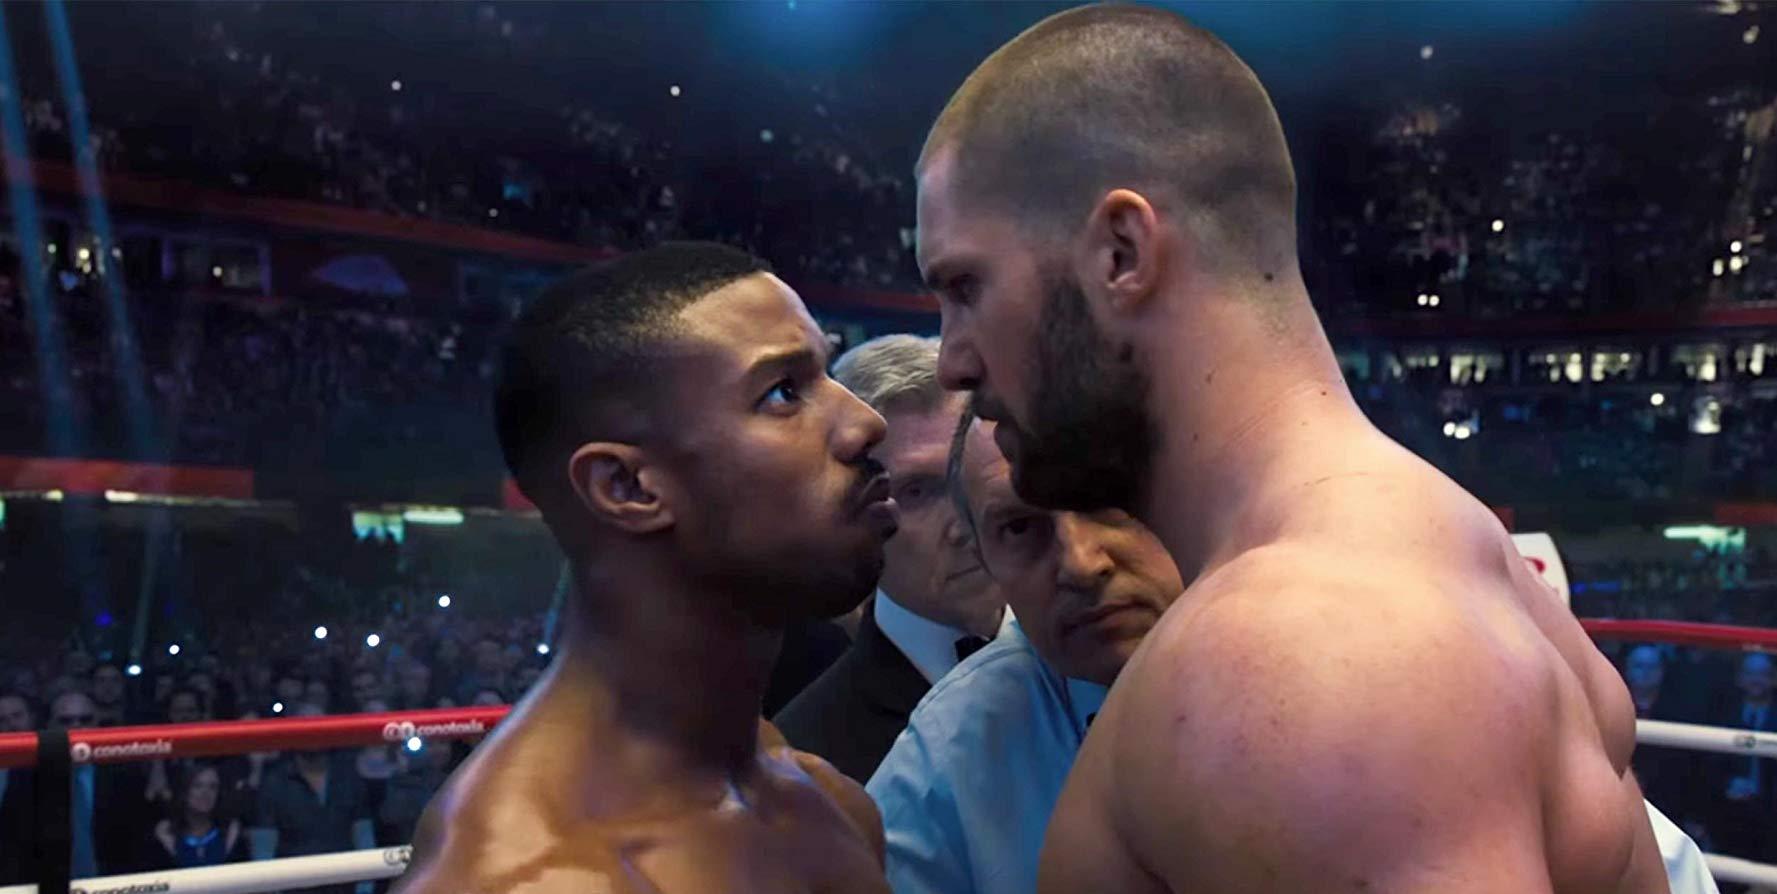 Creed 2 Spoilers Ending Explained Does Michael B Jordan Kill